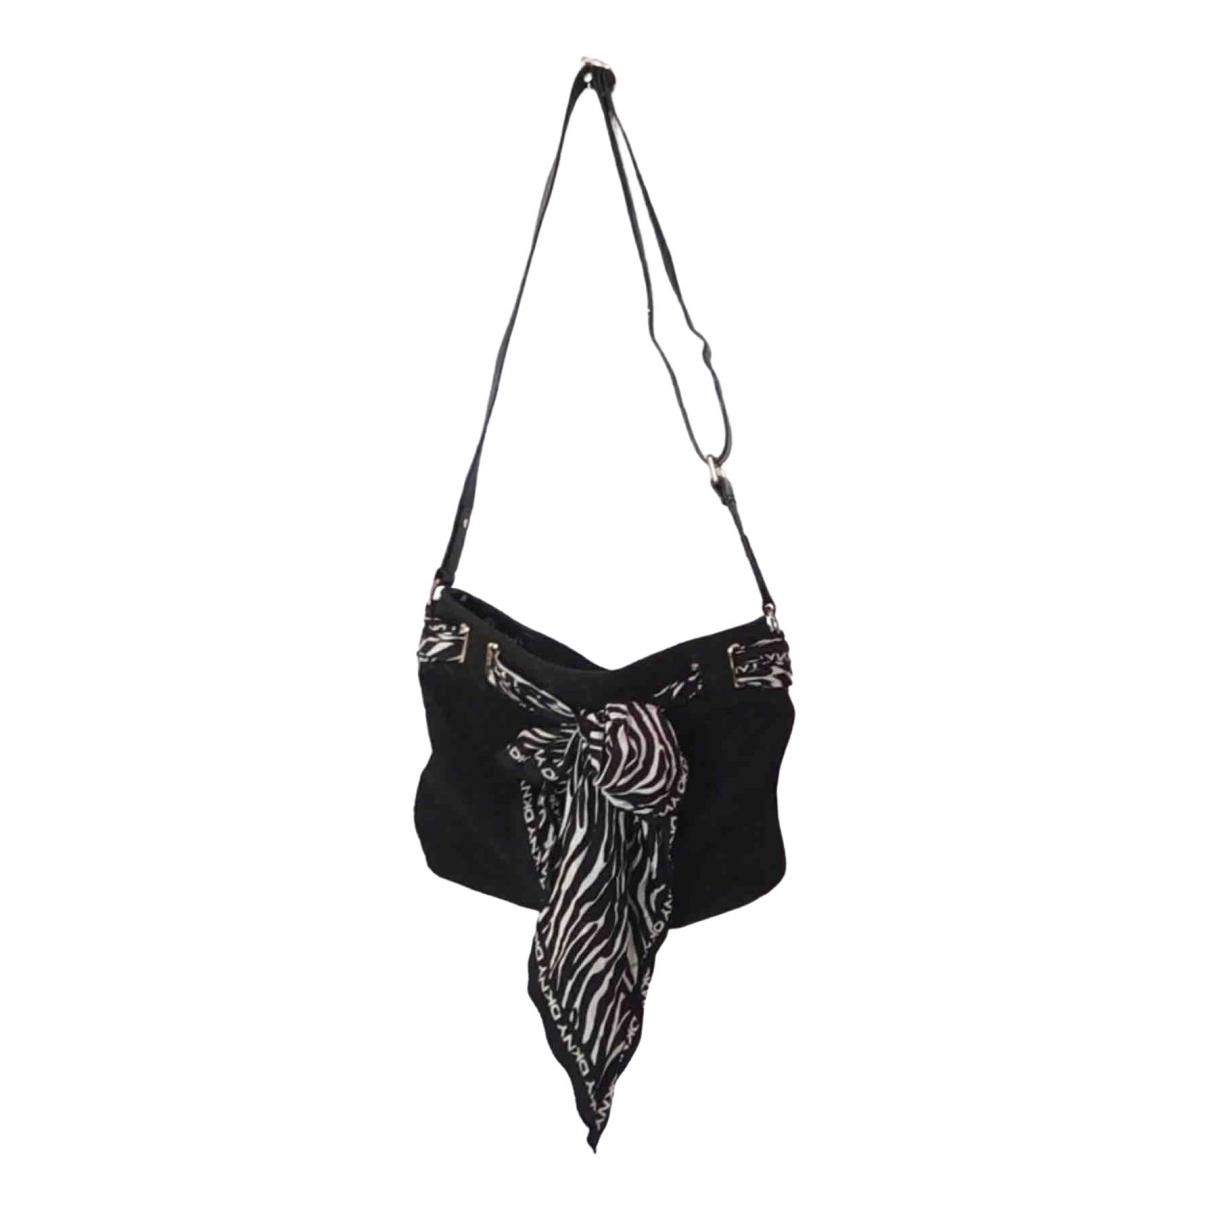 Dkny \N Black handbag for Women \N